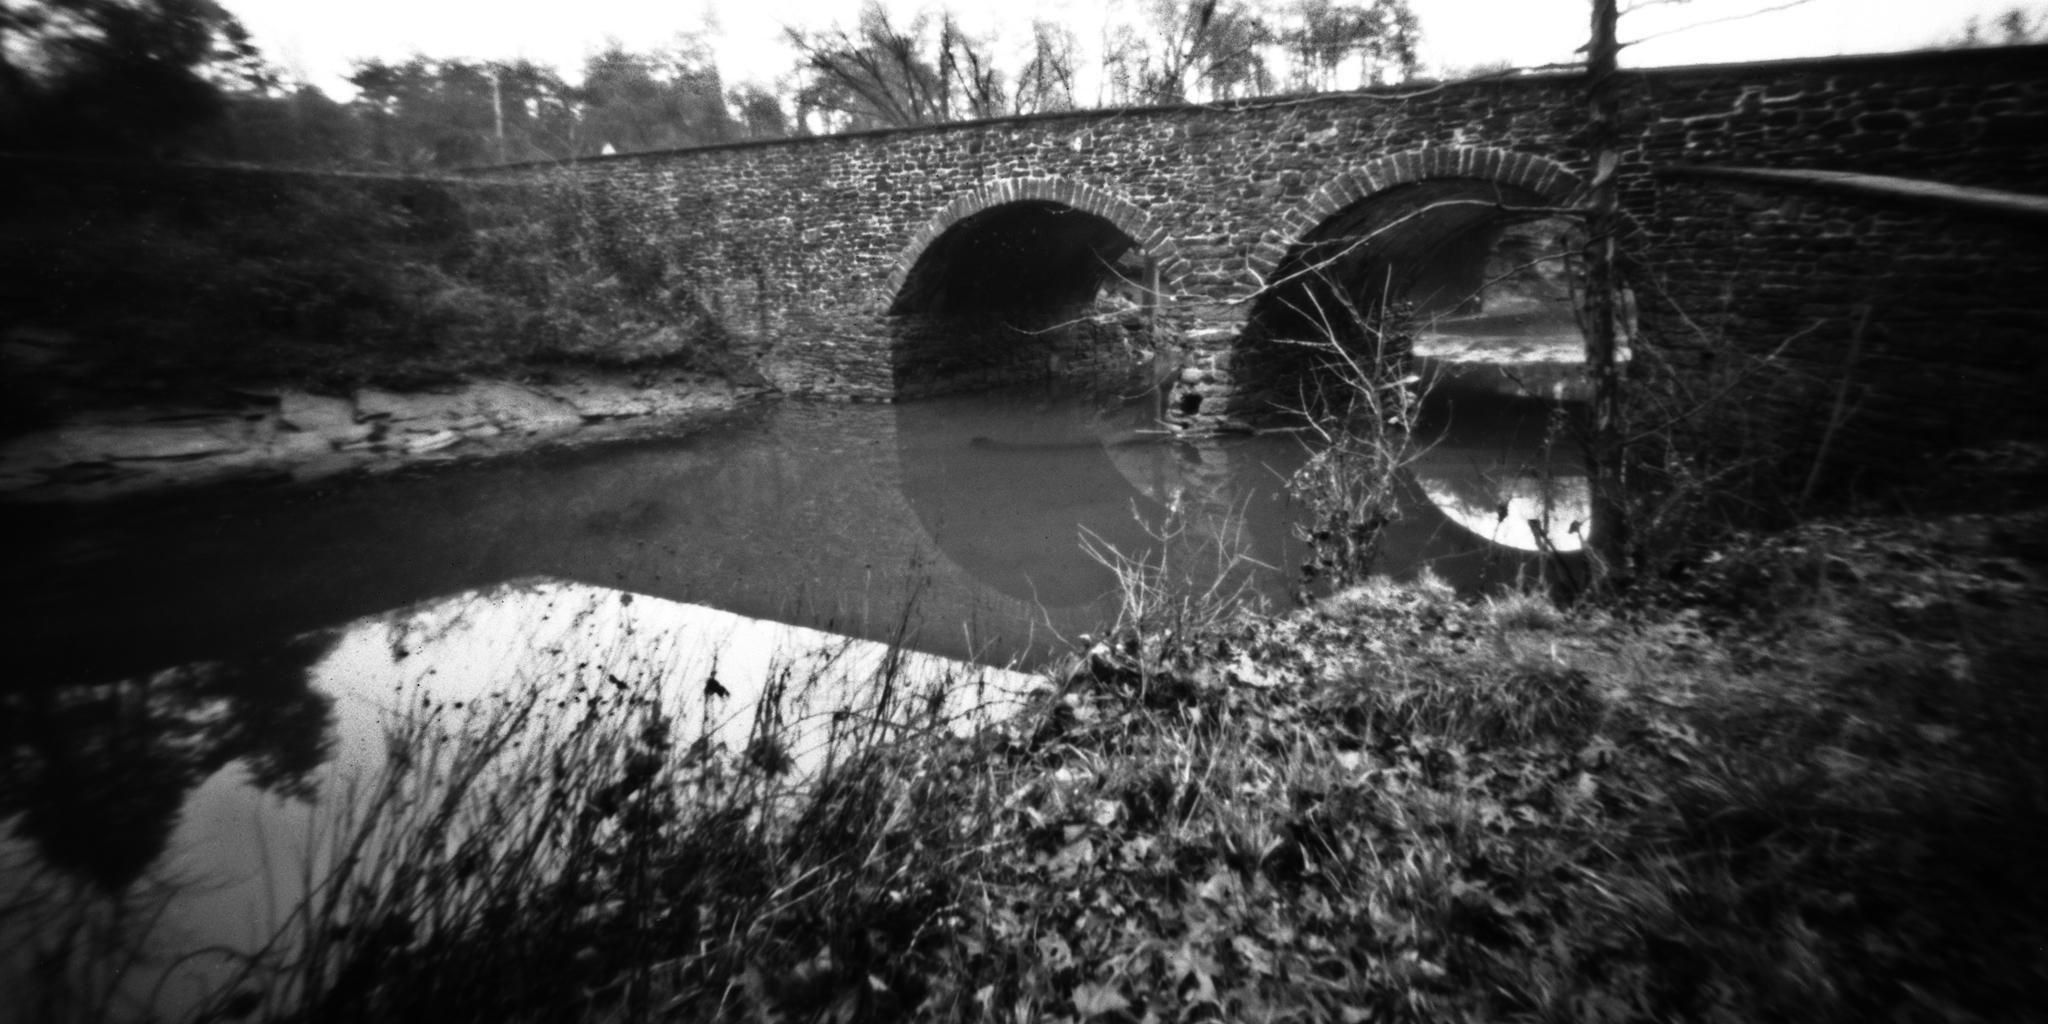 Stone bridge over Bull Run on the Manassas National Battlefield. Manassas, Virginia. Santa Barbara Pinhole Co 75mm 4x5.